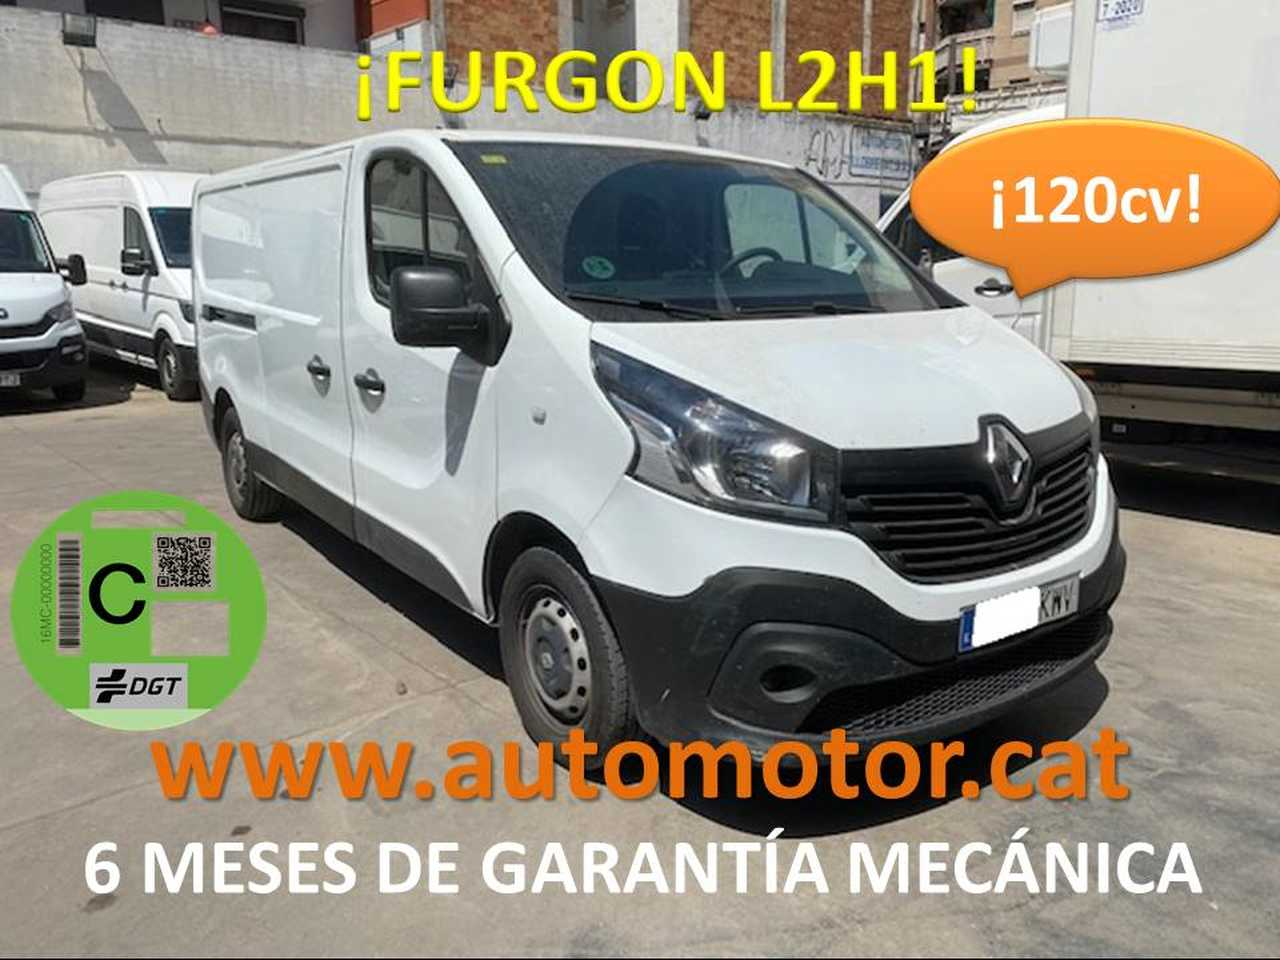 Renault Trafic Furgón 29L2H1 dCi - GARANTIA MECANICA  - Foto 1